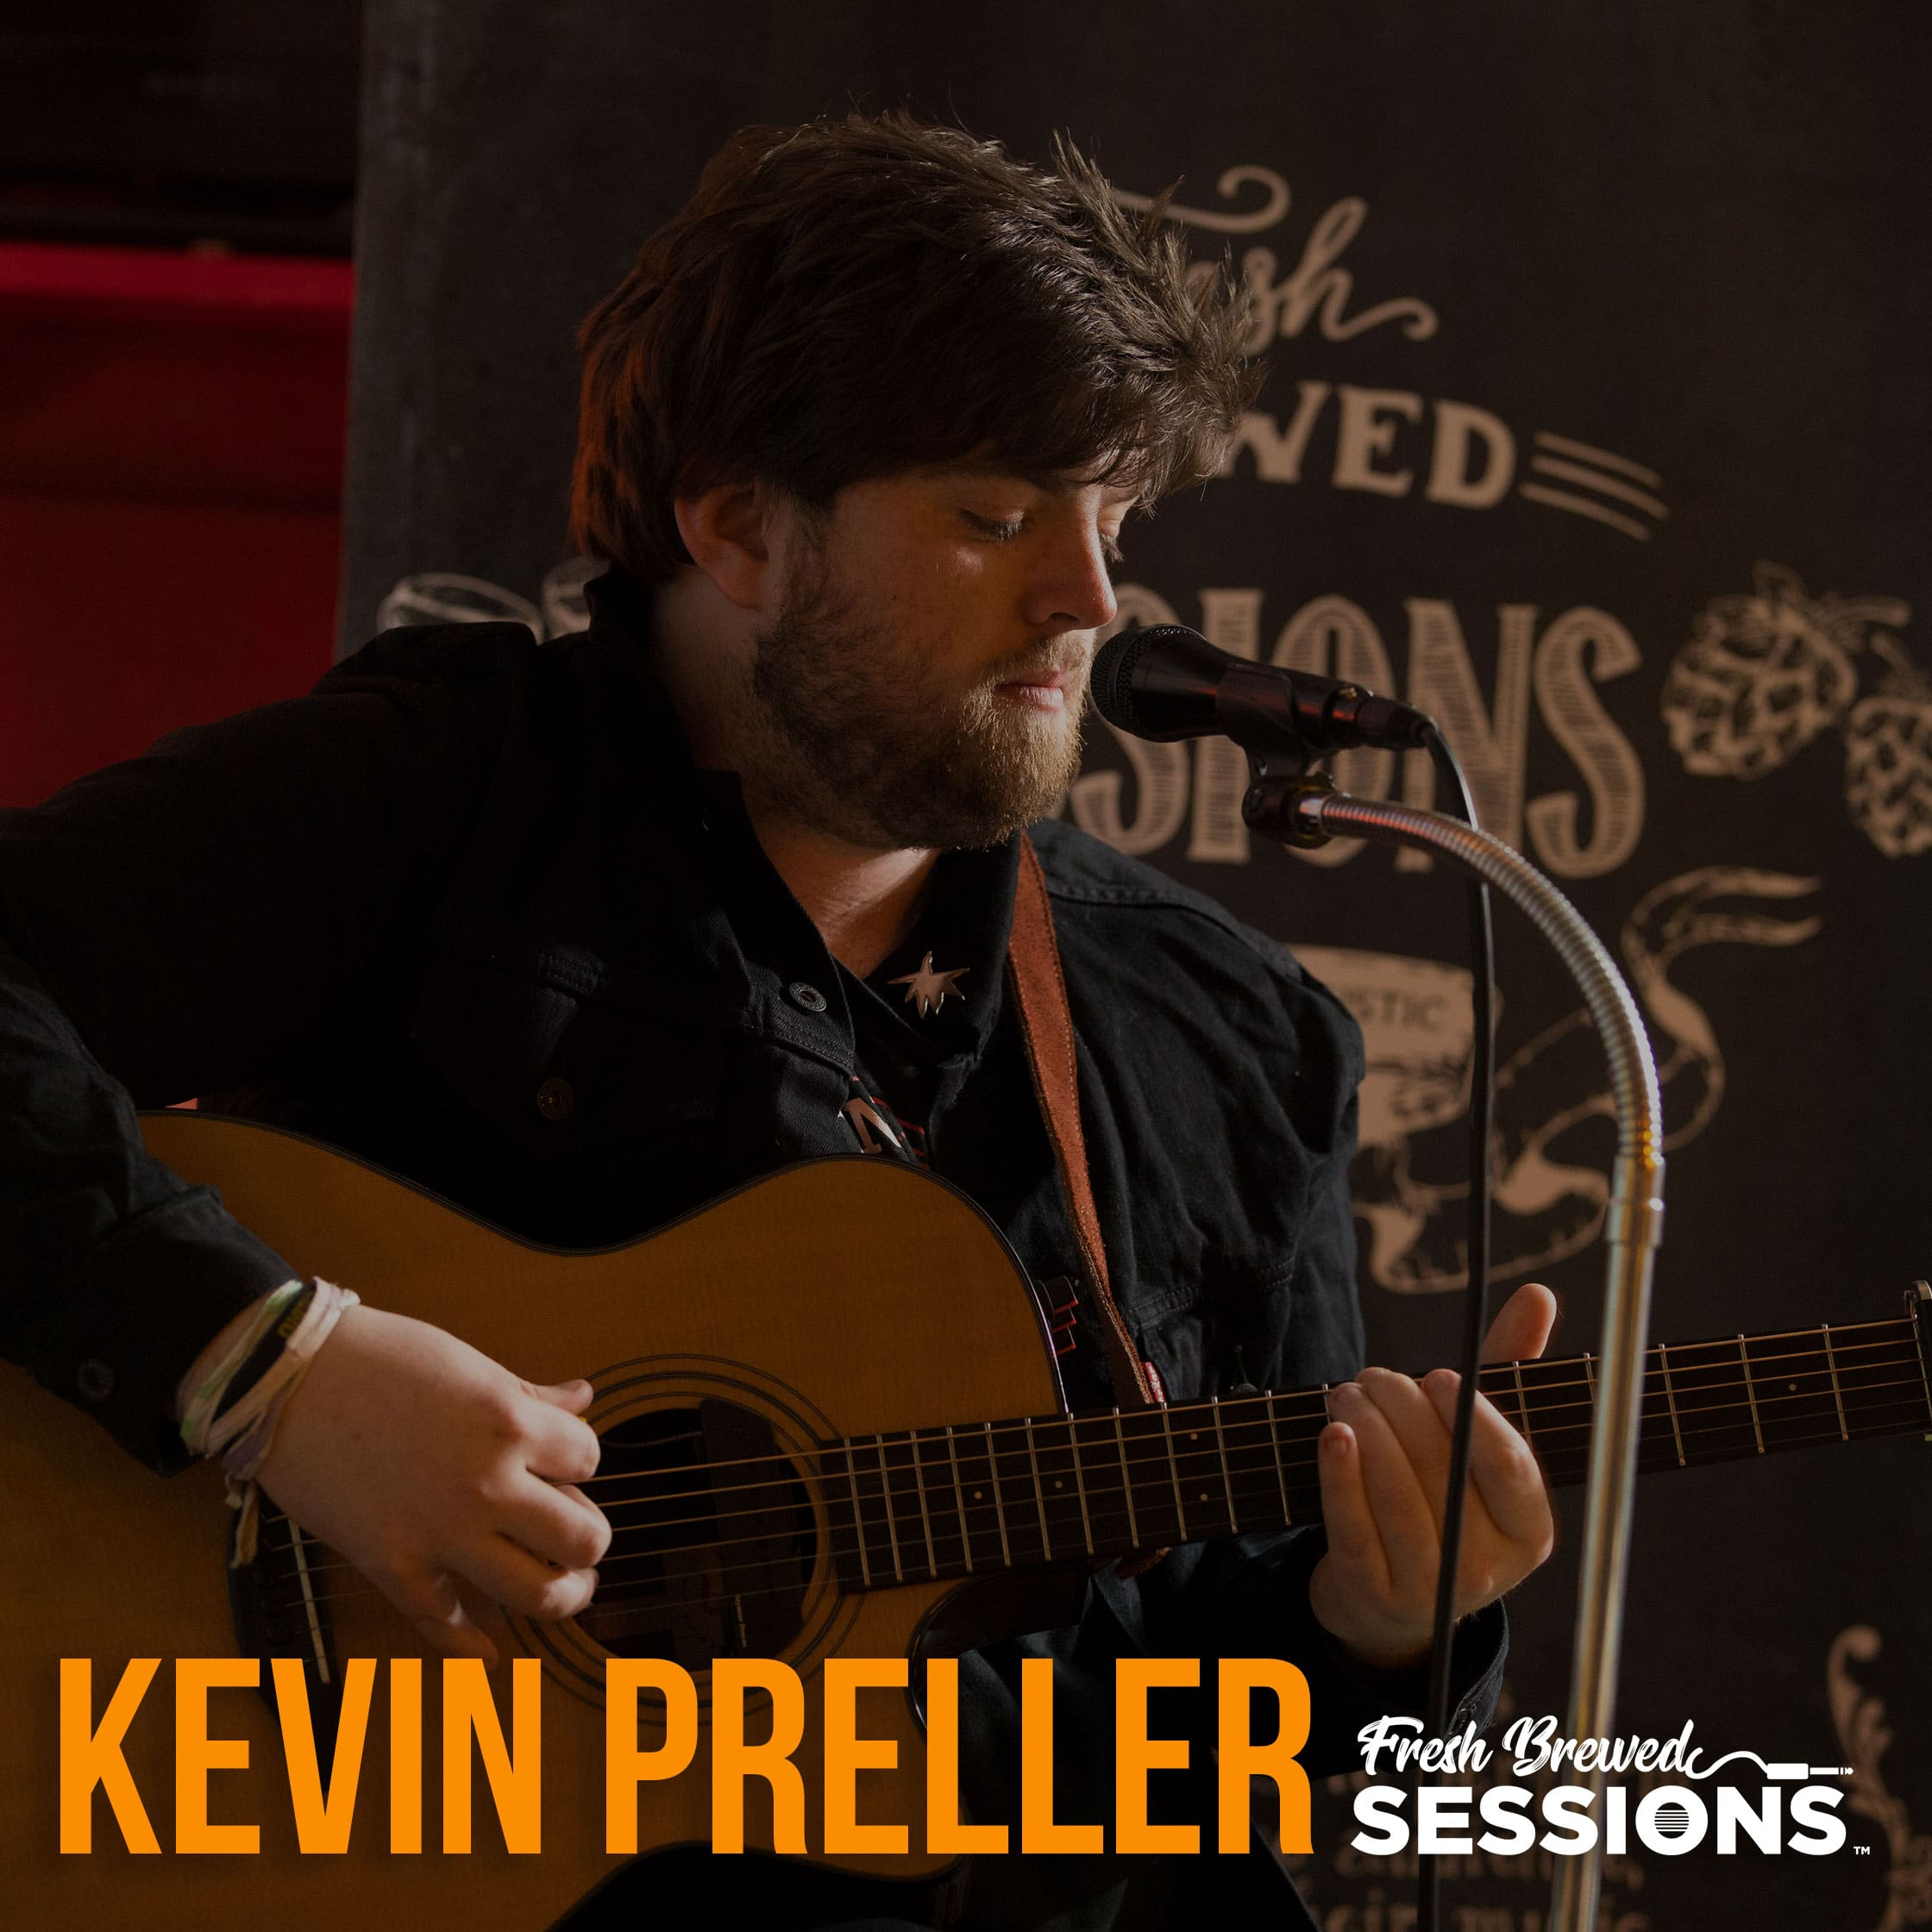 Kevin Preller